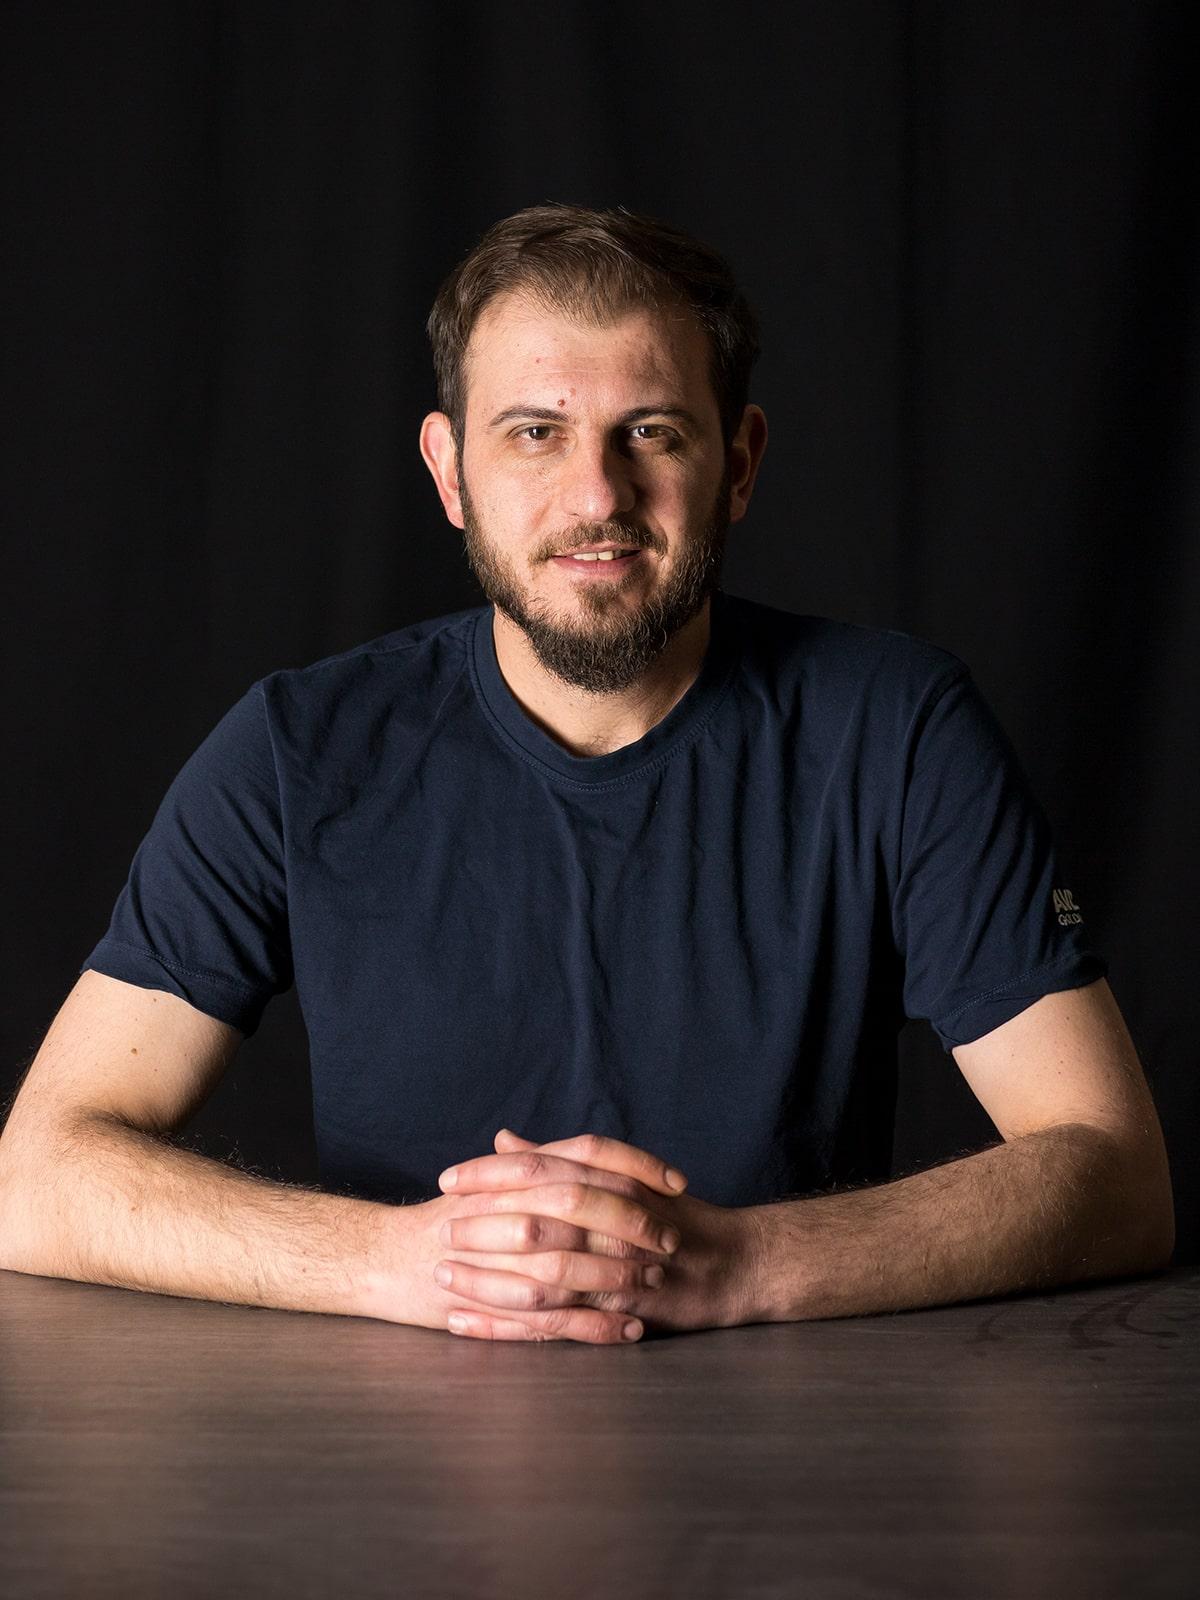 Bekir Canoski, Druck, avd goldach ag